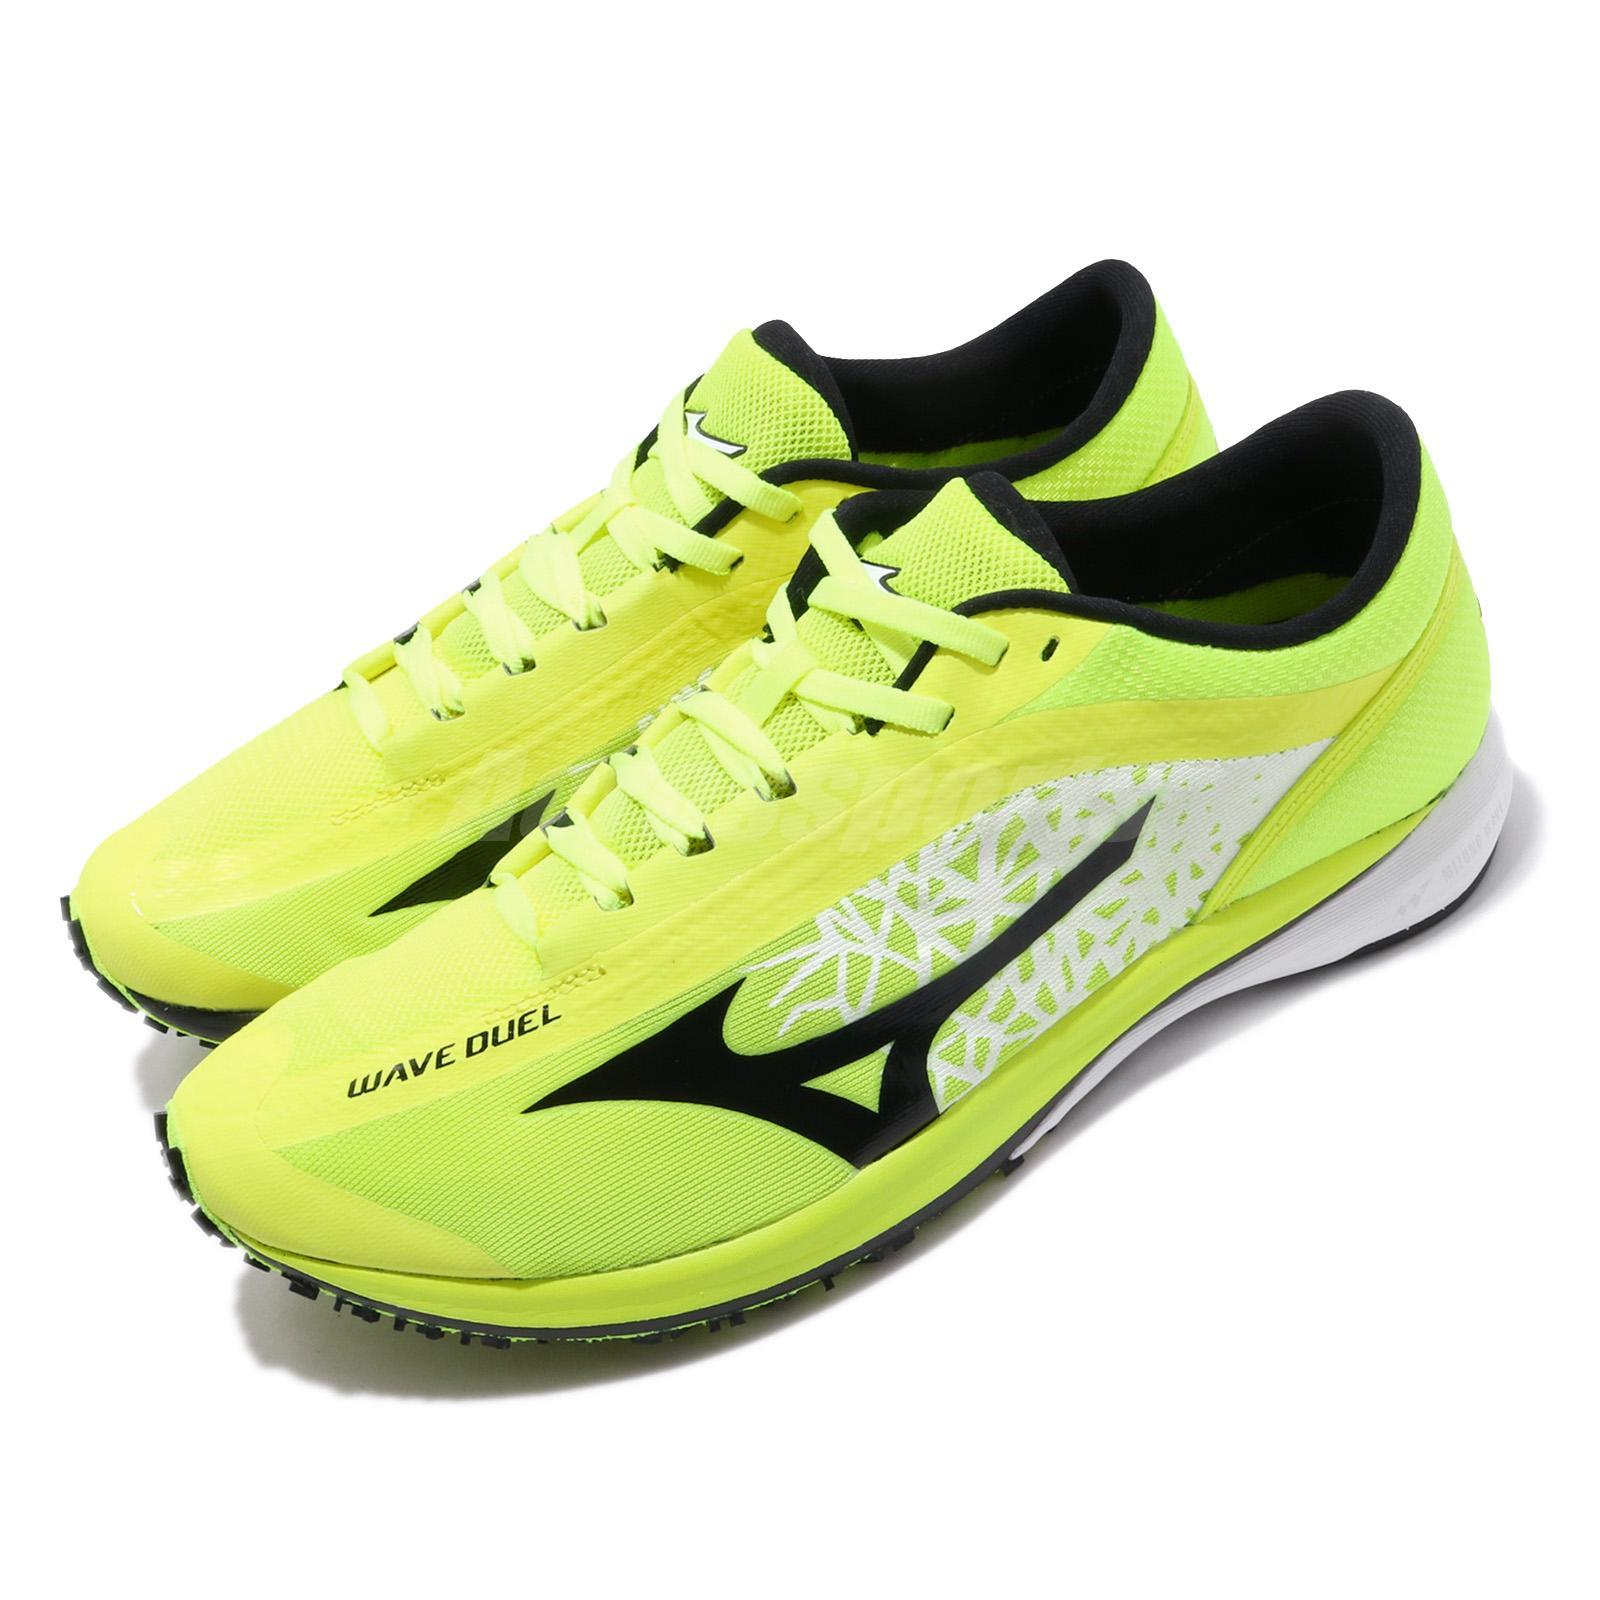 mizuno mens running shoes size 11 yellow youth